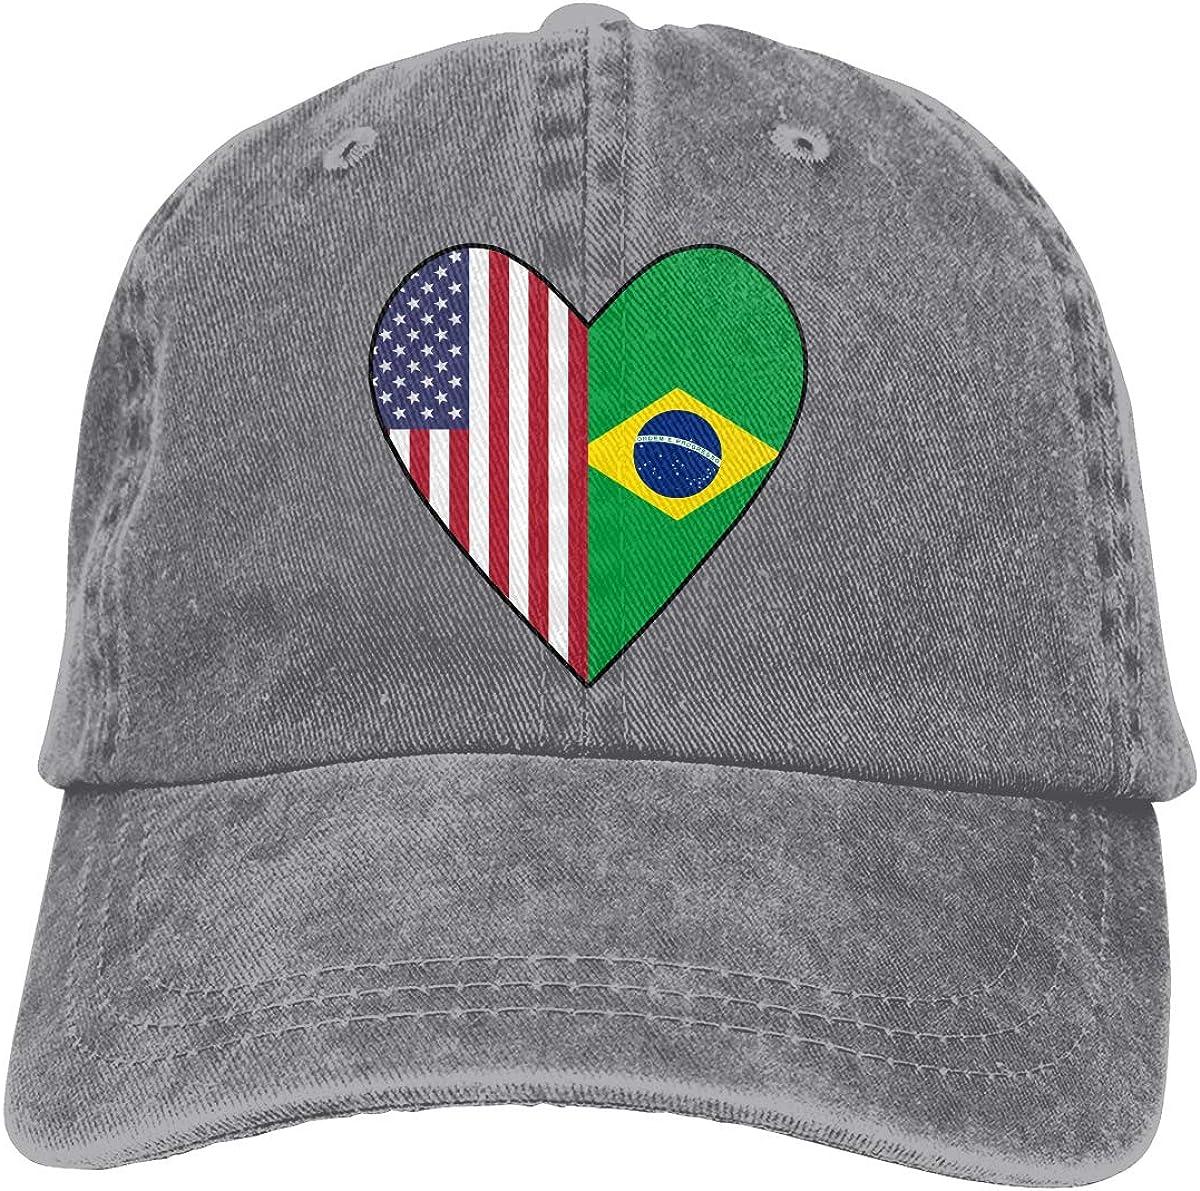 Half Brazil Flag Half USA Flag Love Heart Unisex Custom Cowboy Sun Hat Adjustable Baseball Cap